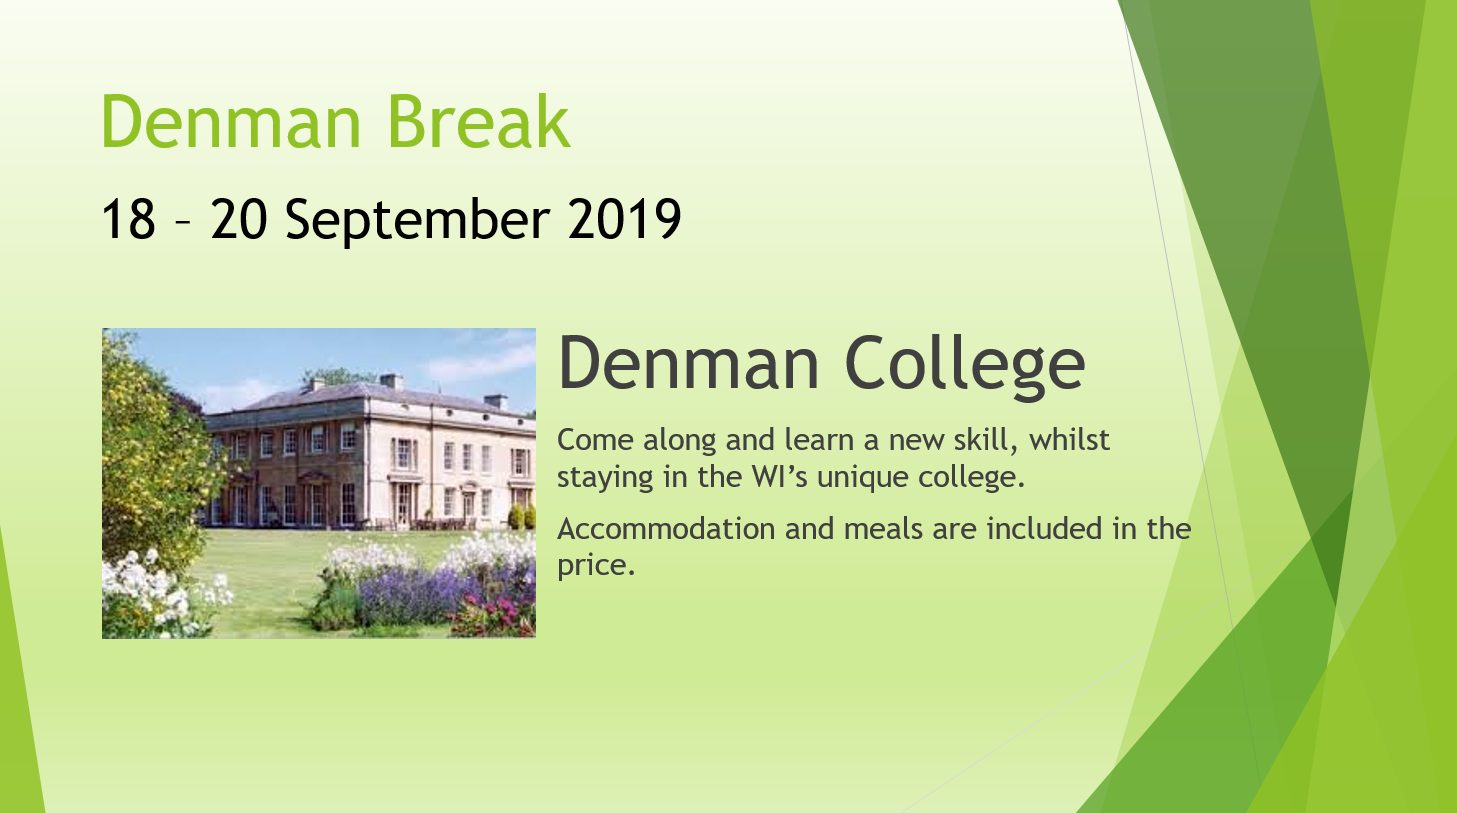 Denman Break